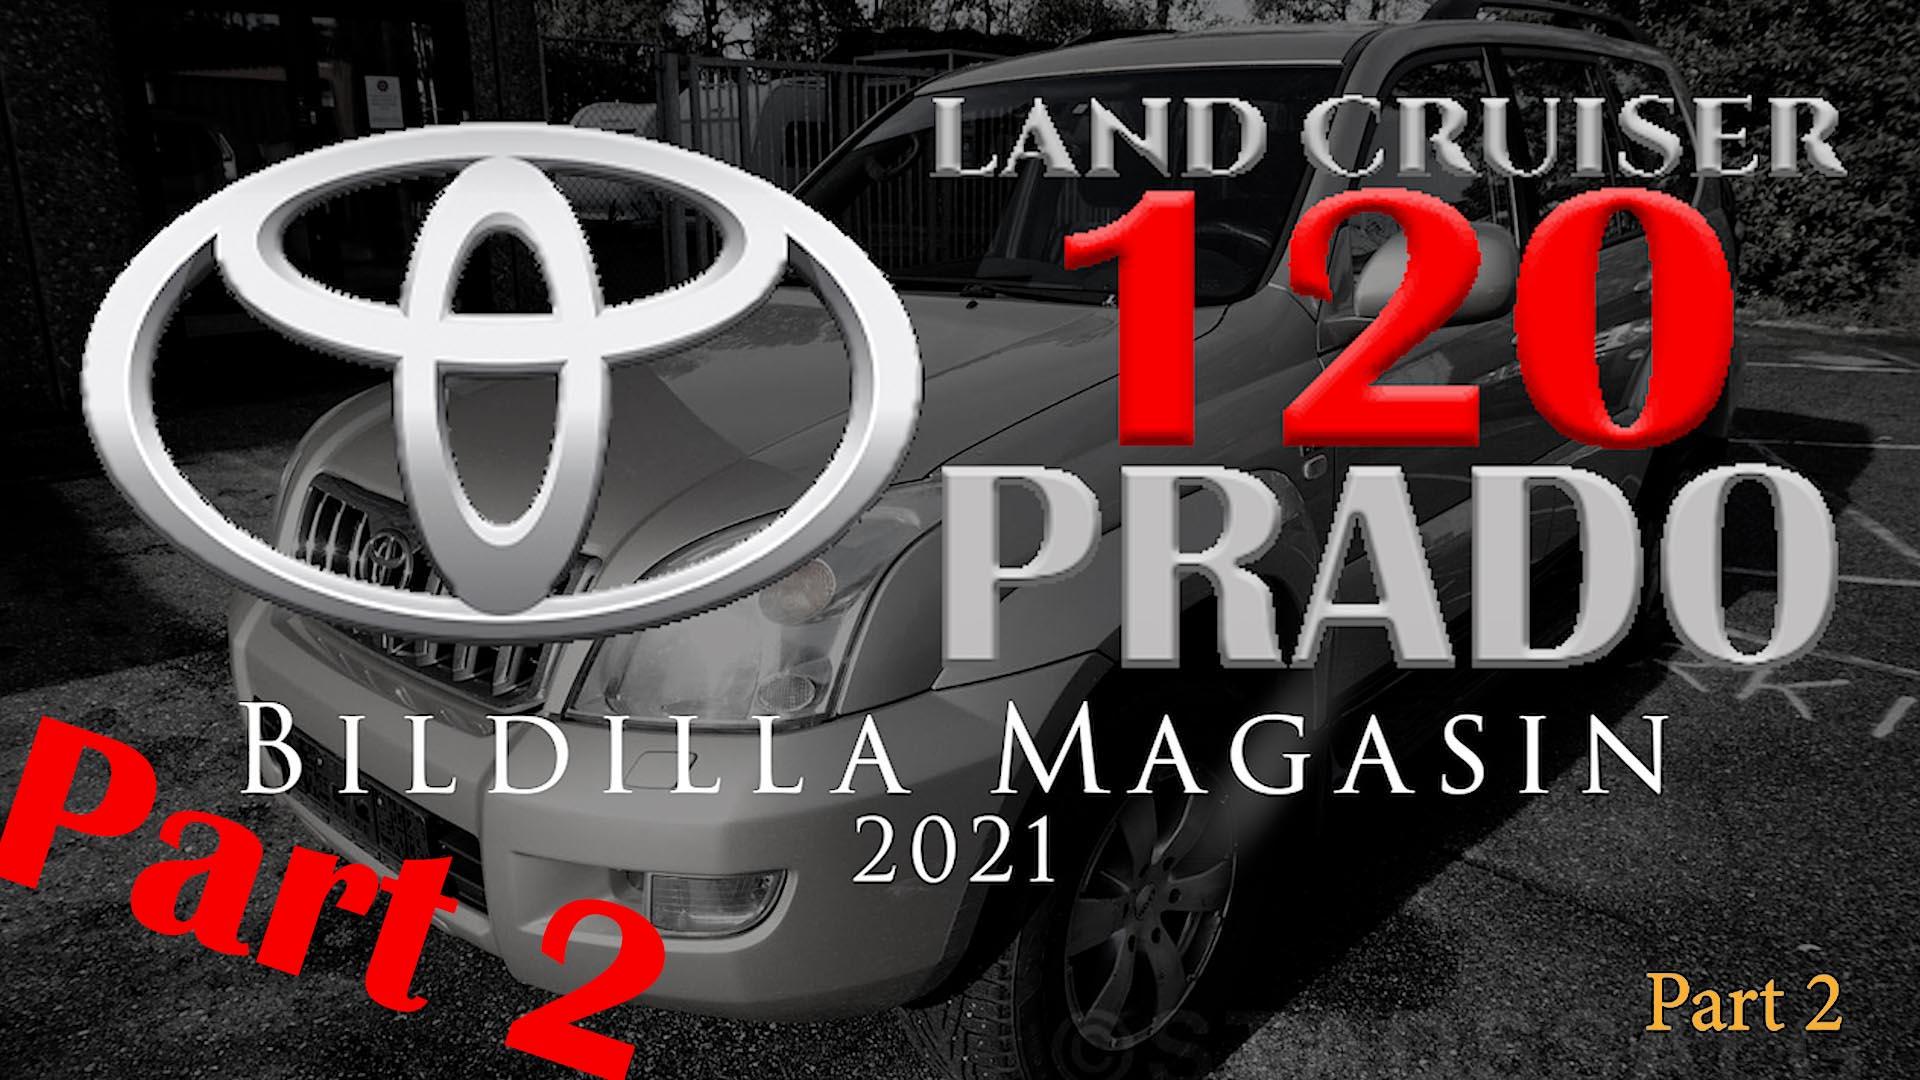 Toyota Land Cruiser / PRADO 120 information and setup, part 2